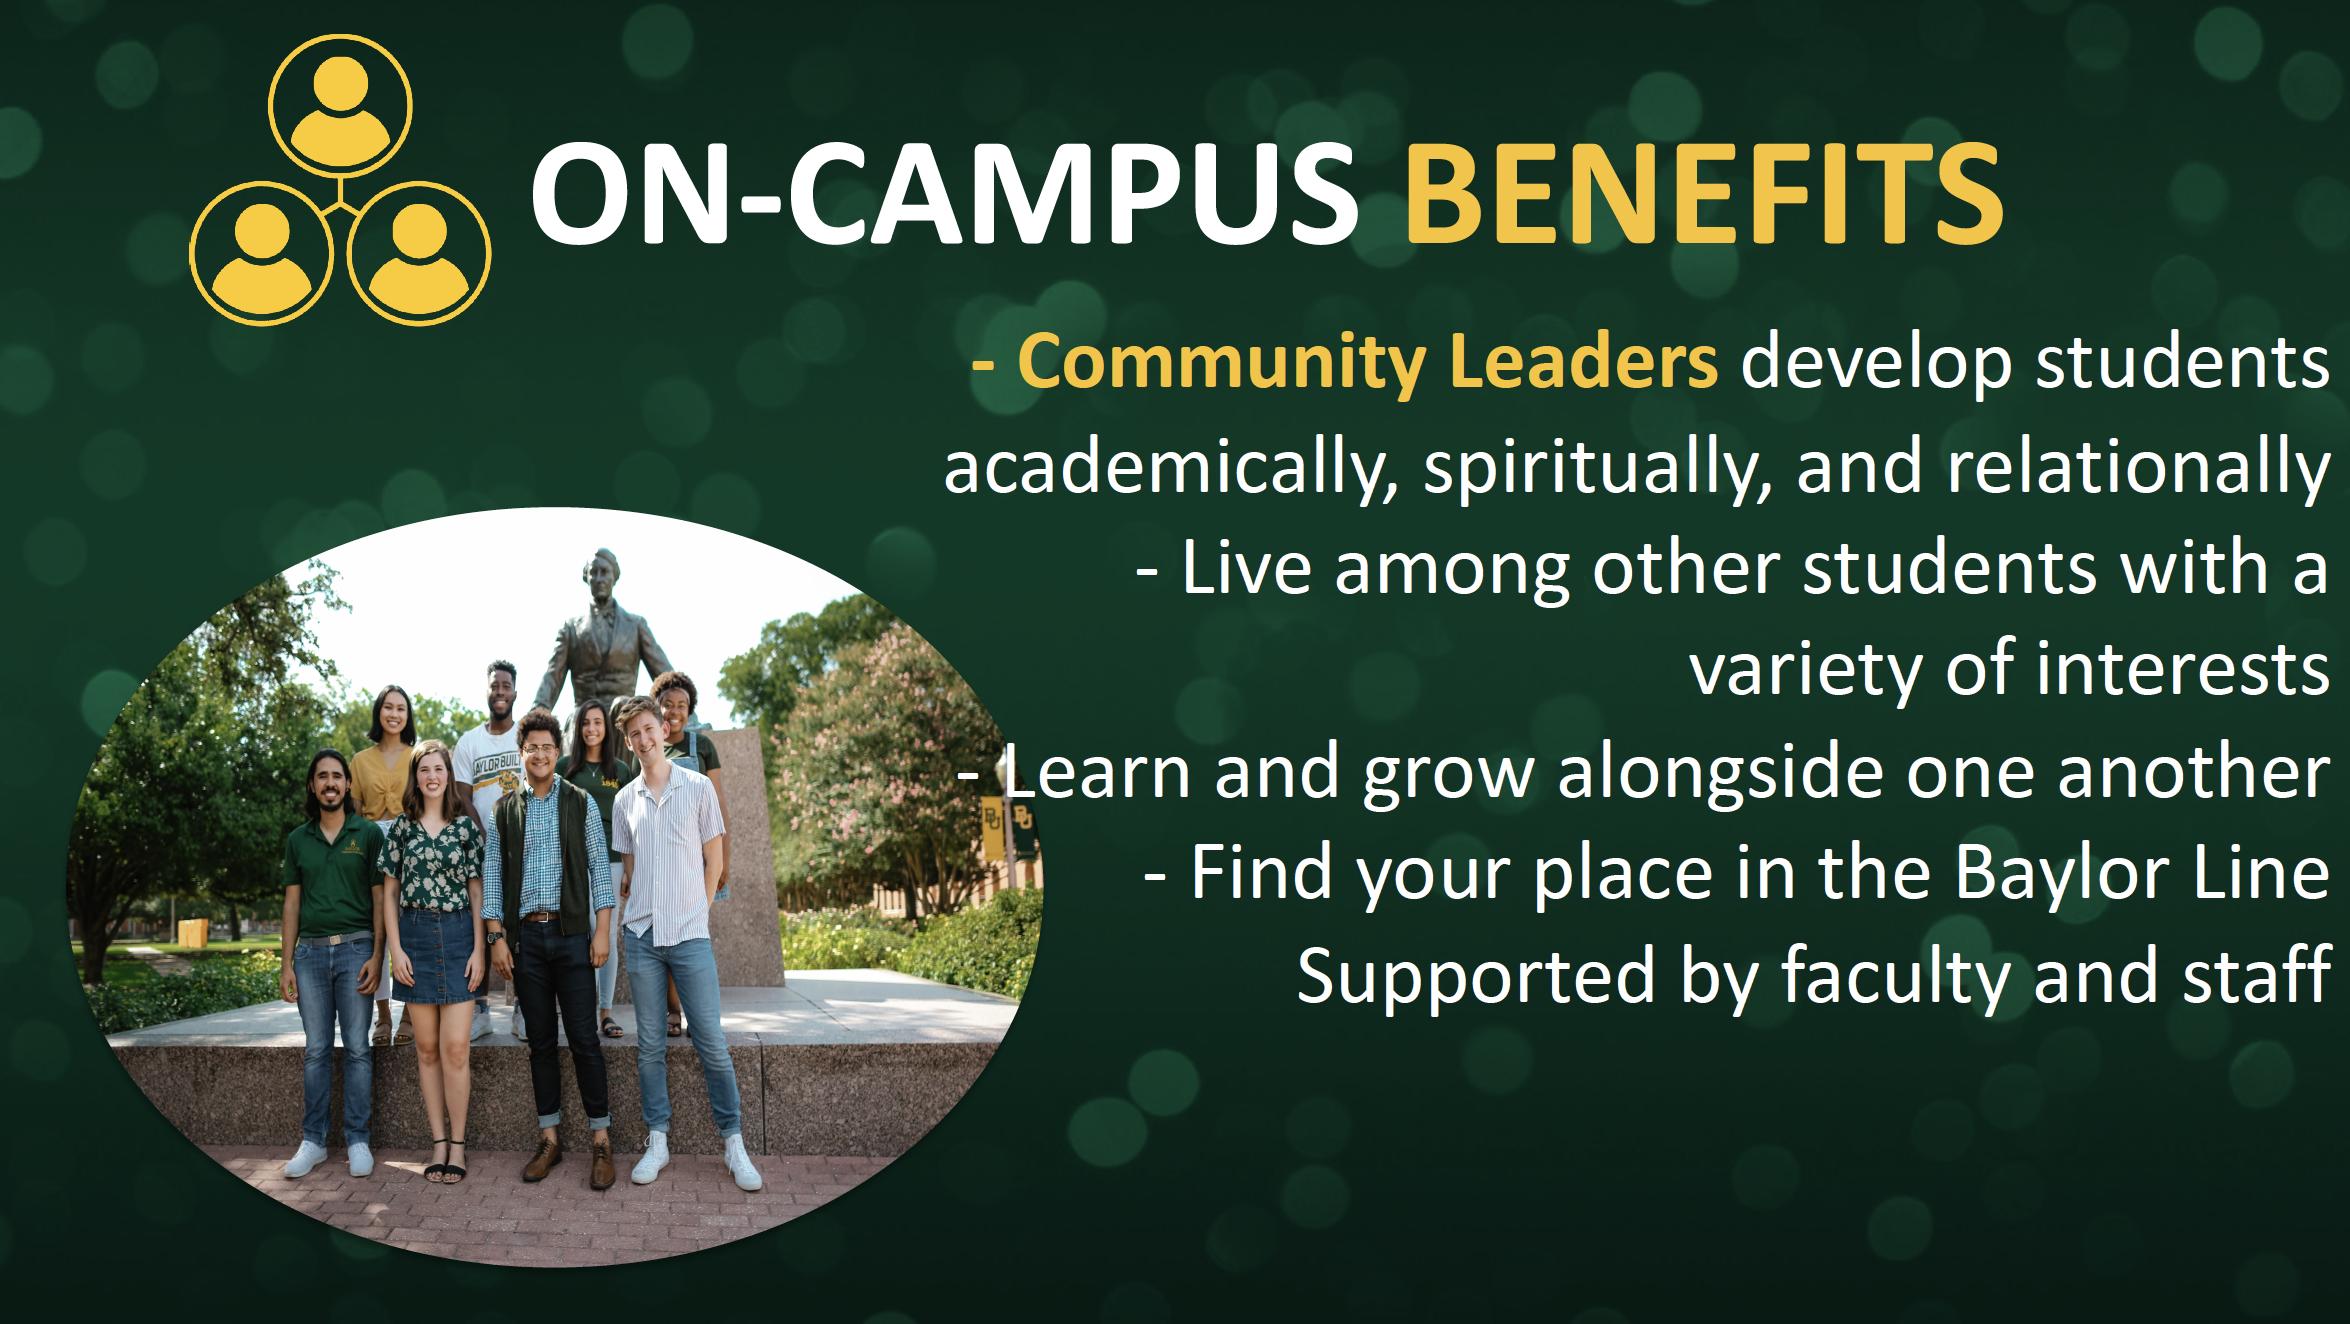 On-Campus Benefits